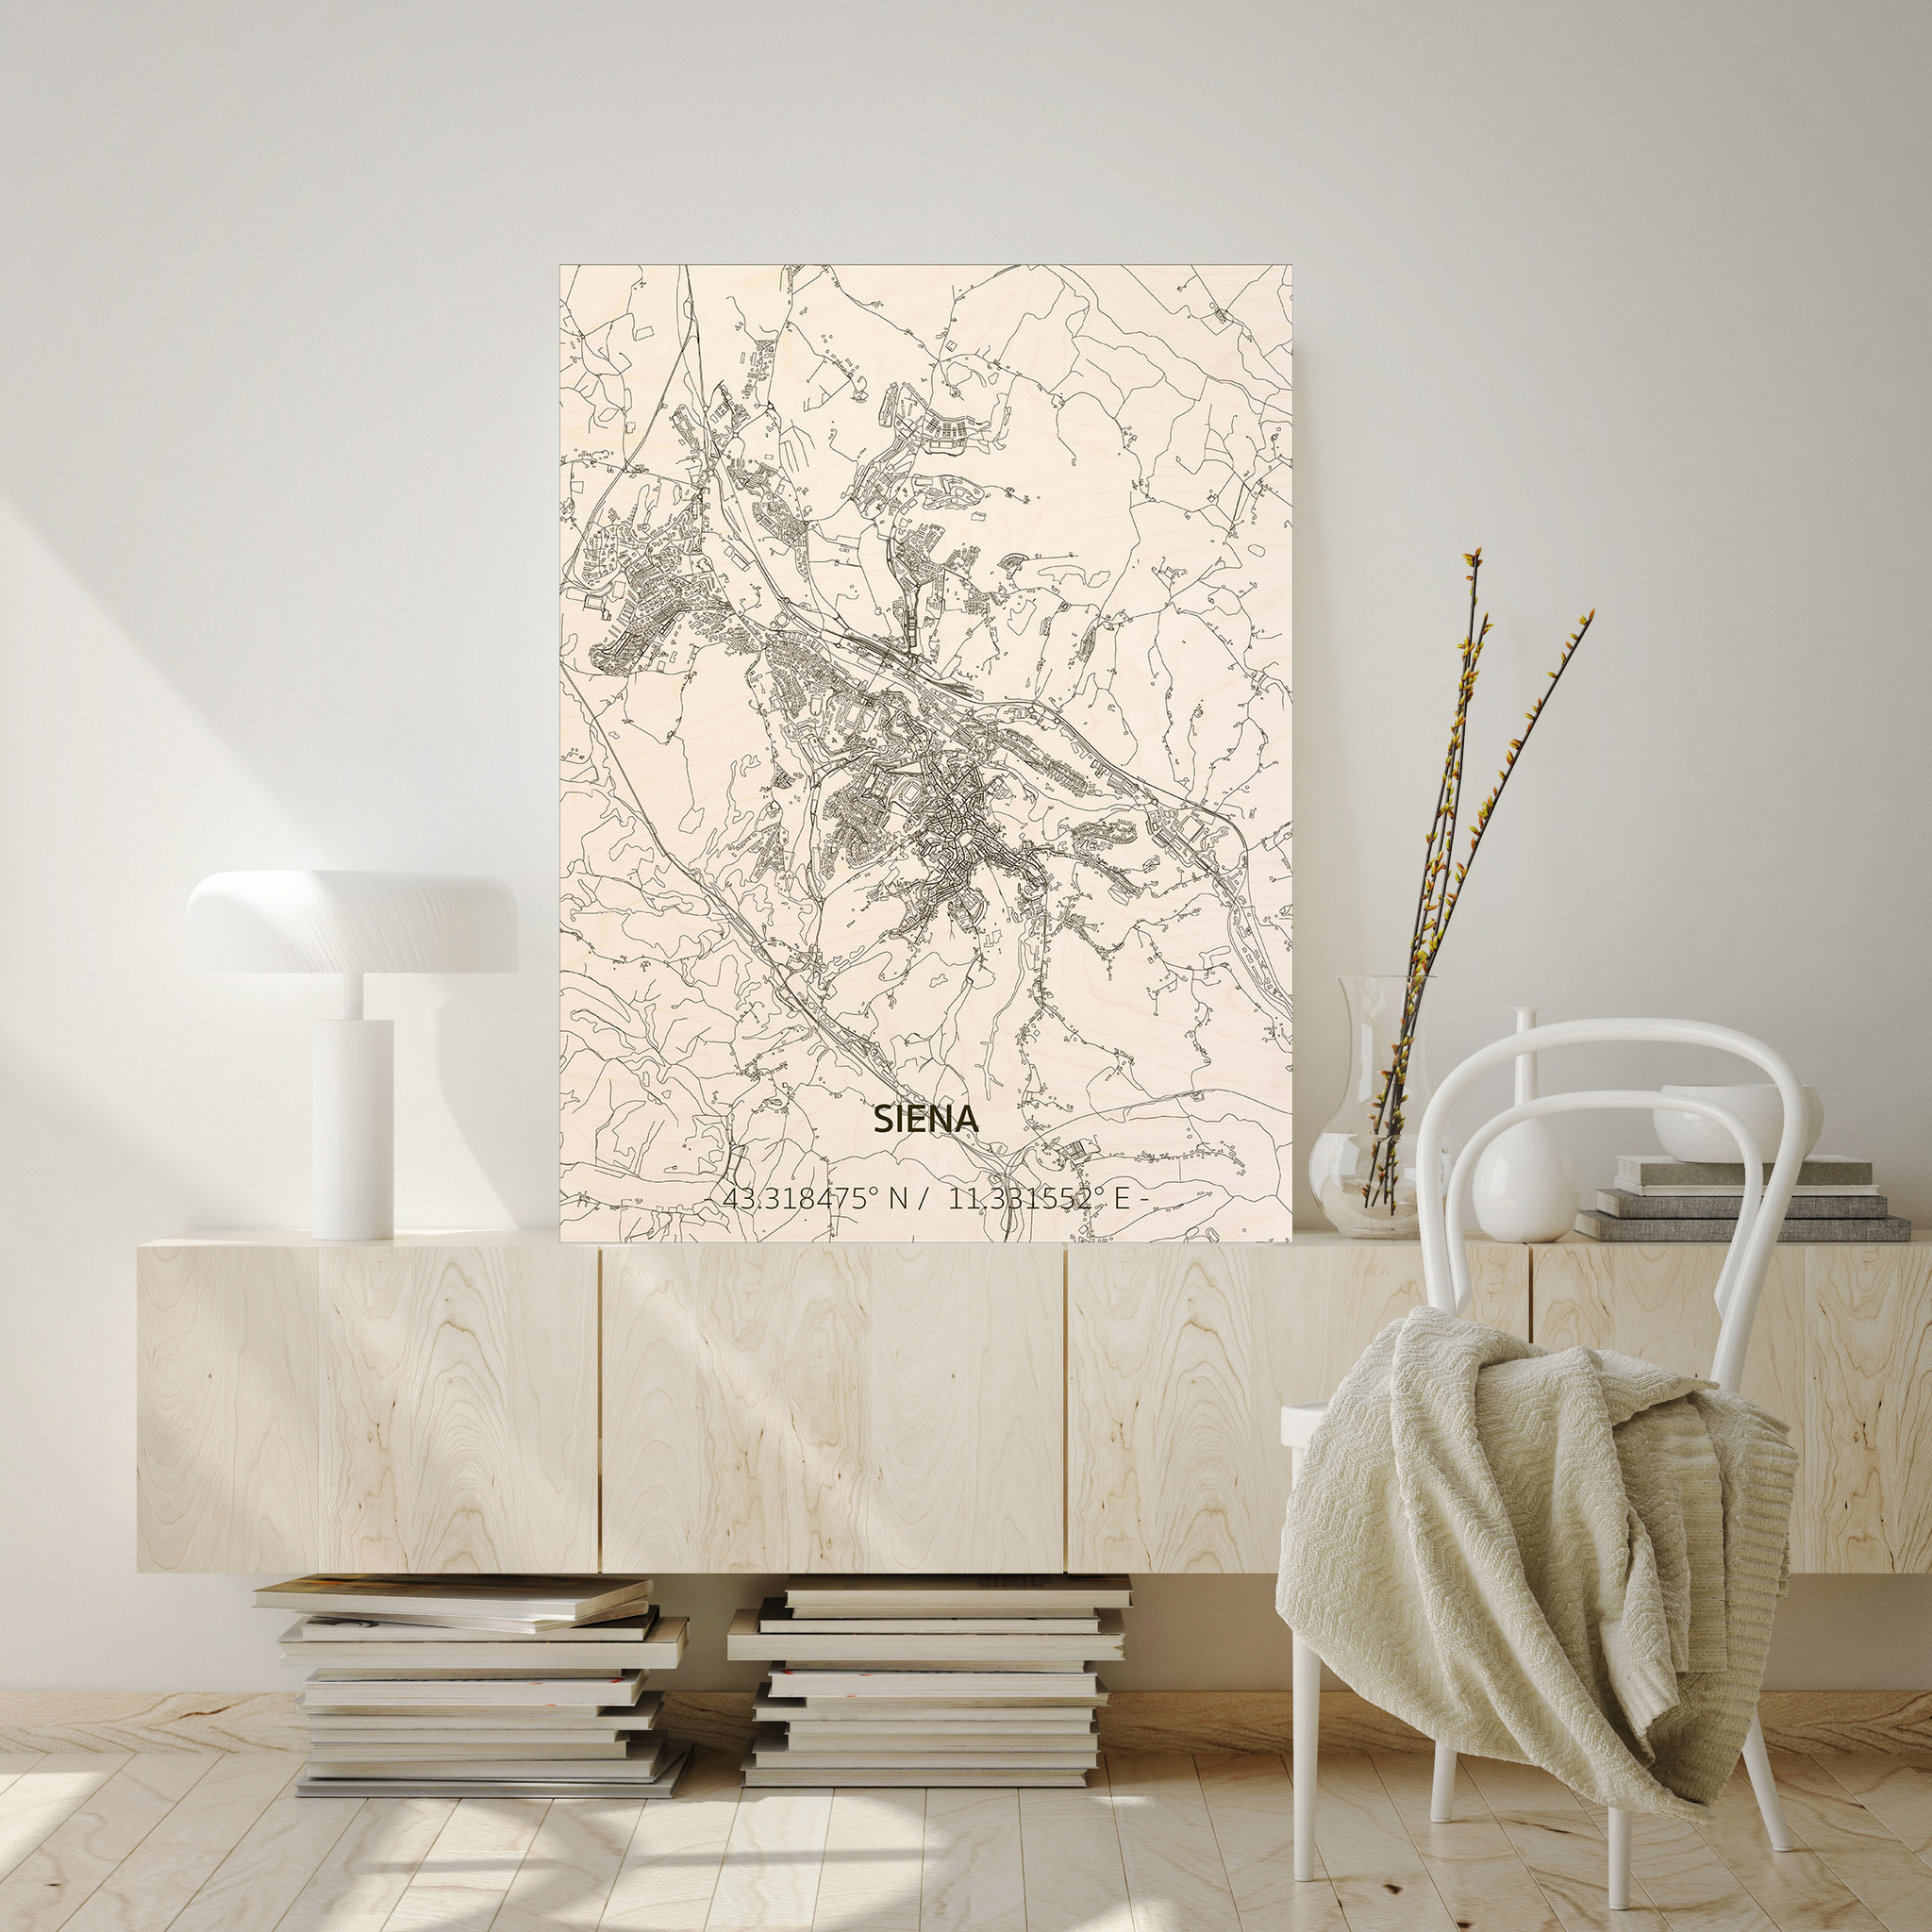 Citymap Siena | wooden wall decoration-2